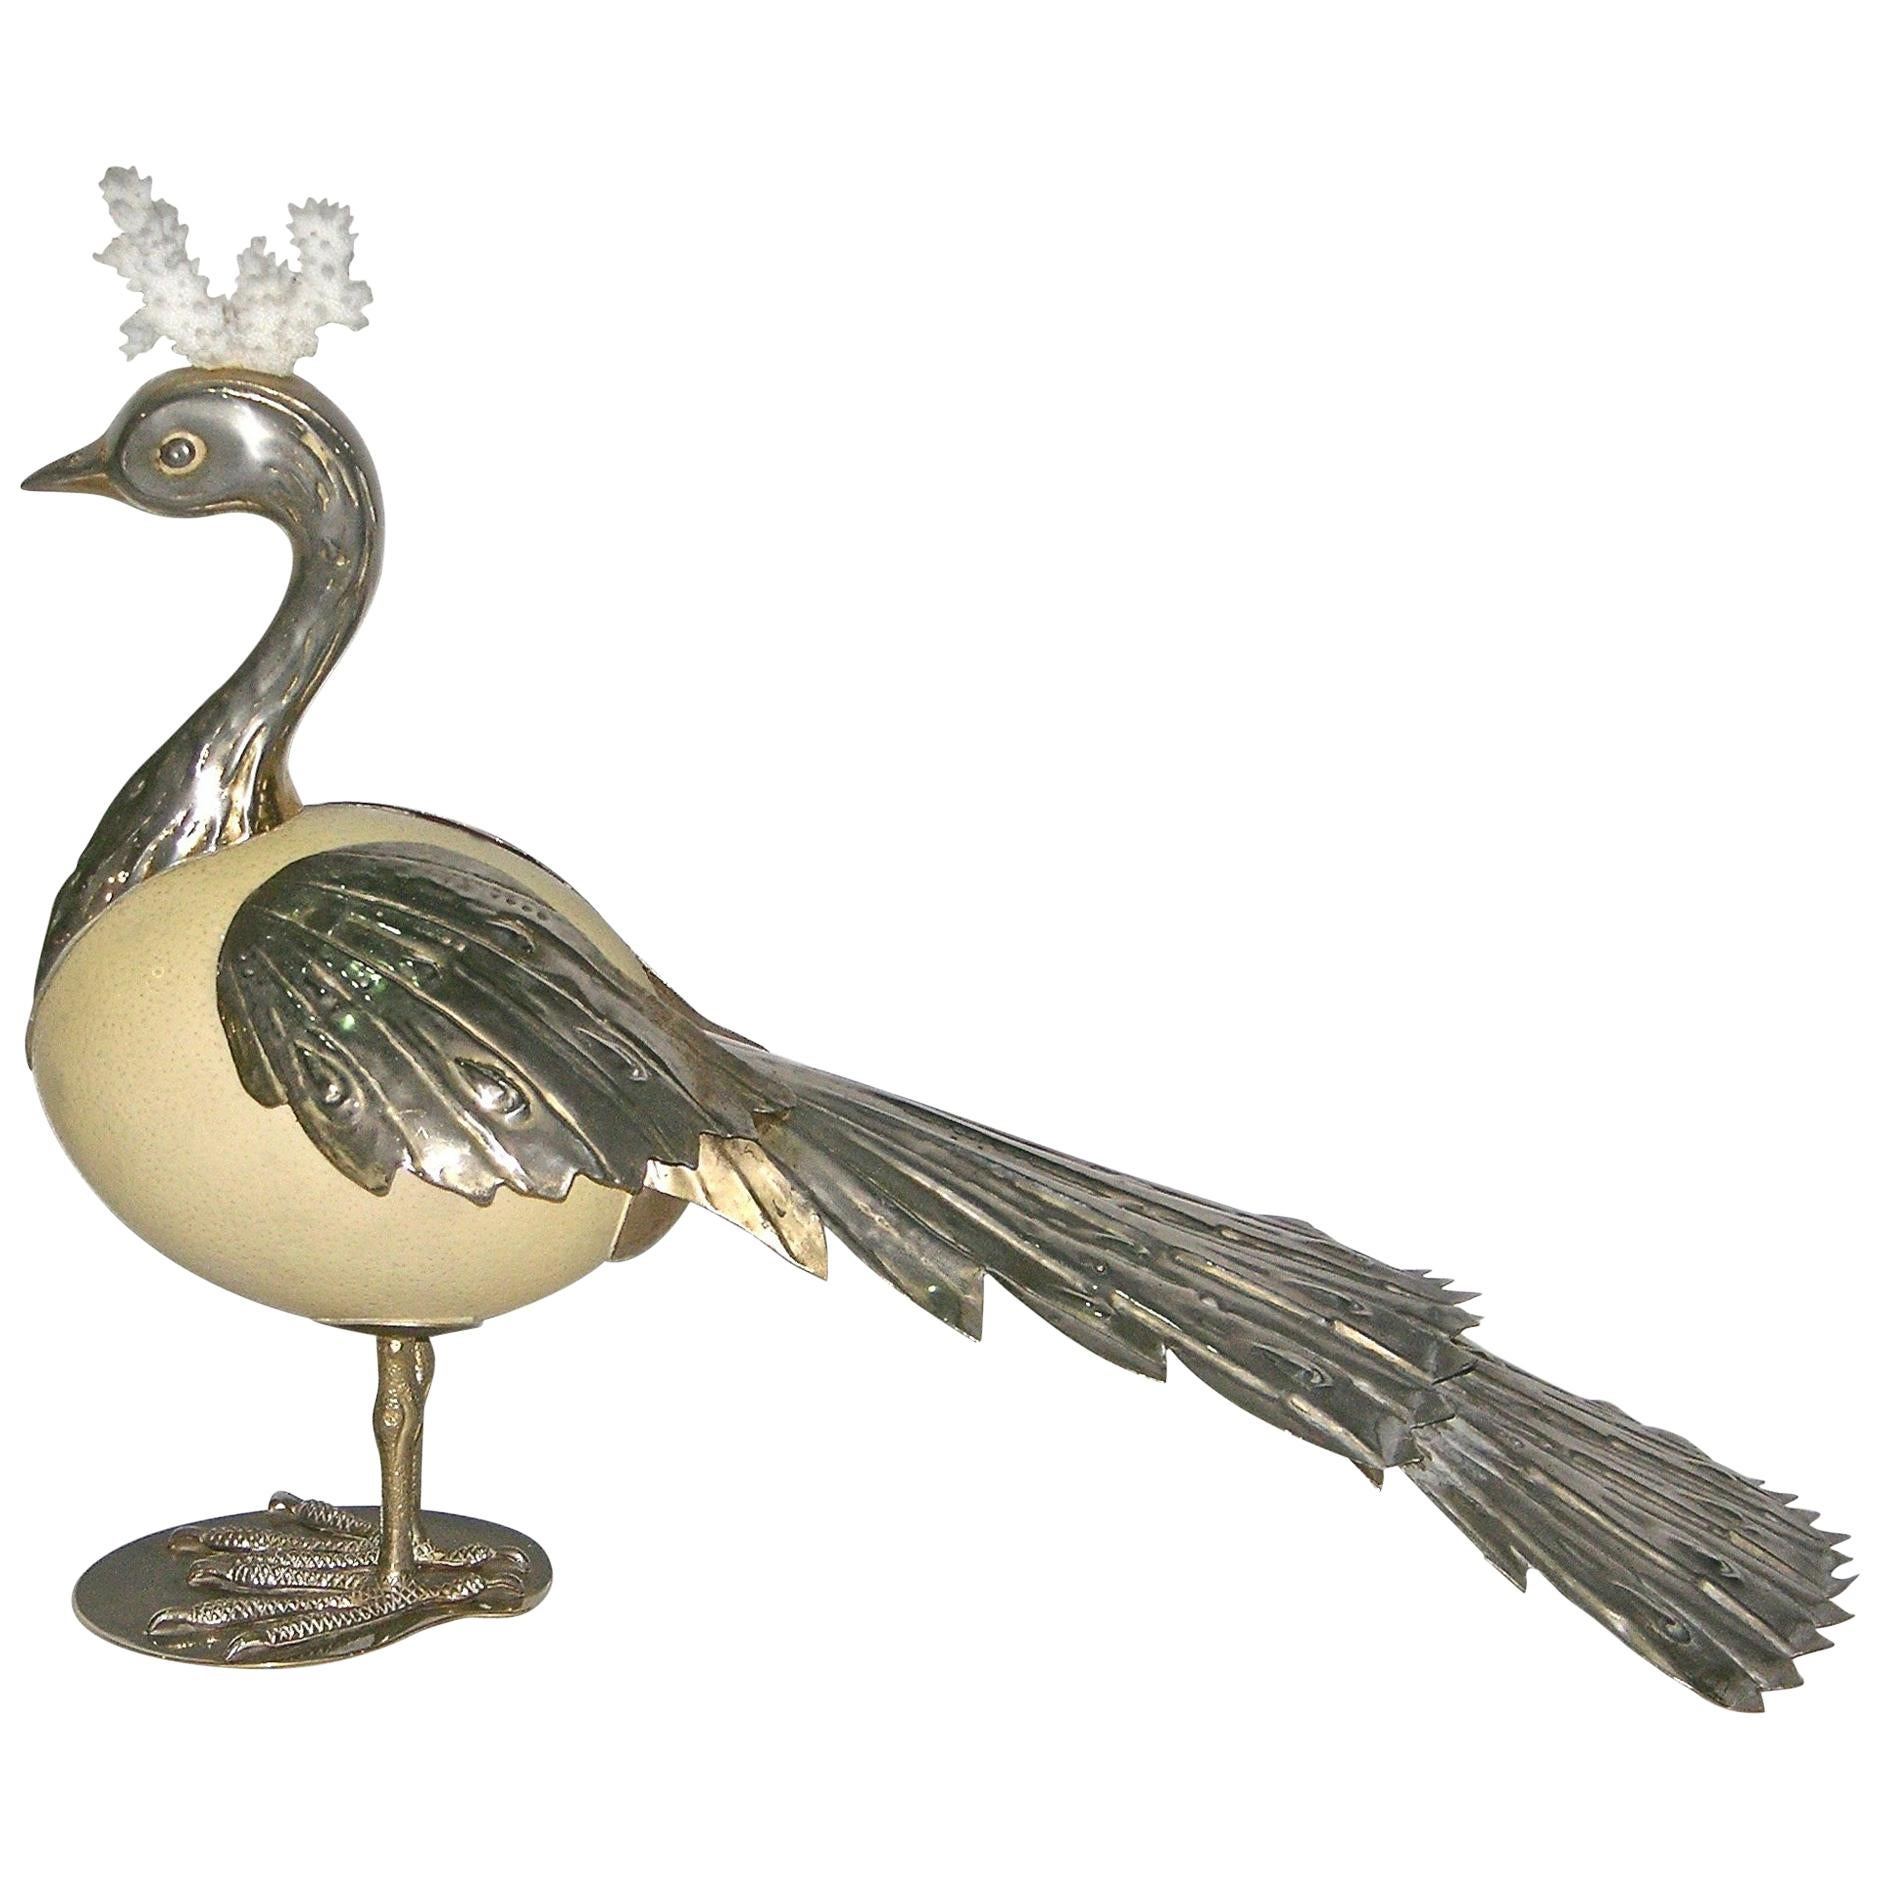 Antonio Pavia 1970s Italian Silver Plated Bird Sculpture with White Coral